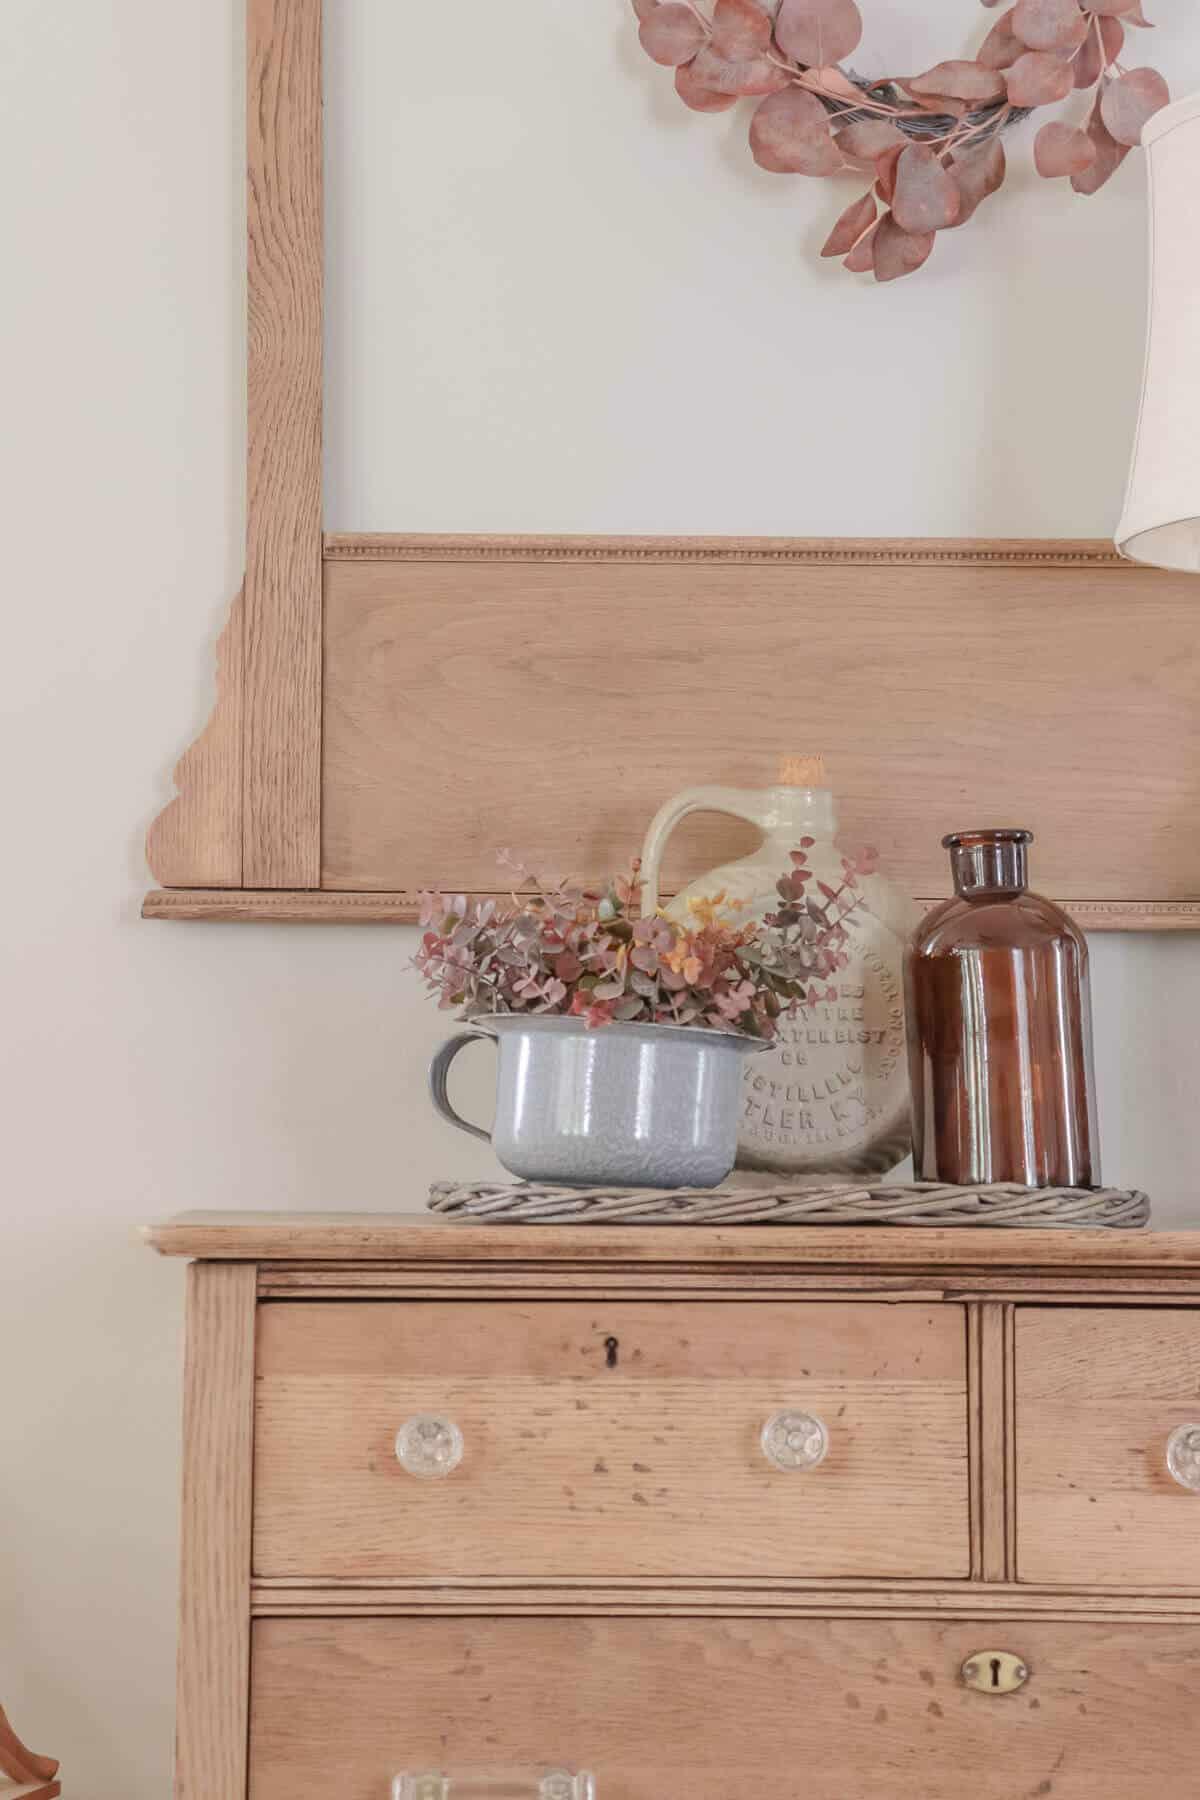 vintage crocks, amber bottles and gray spatterware in a fall arrangement